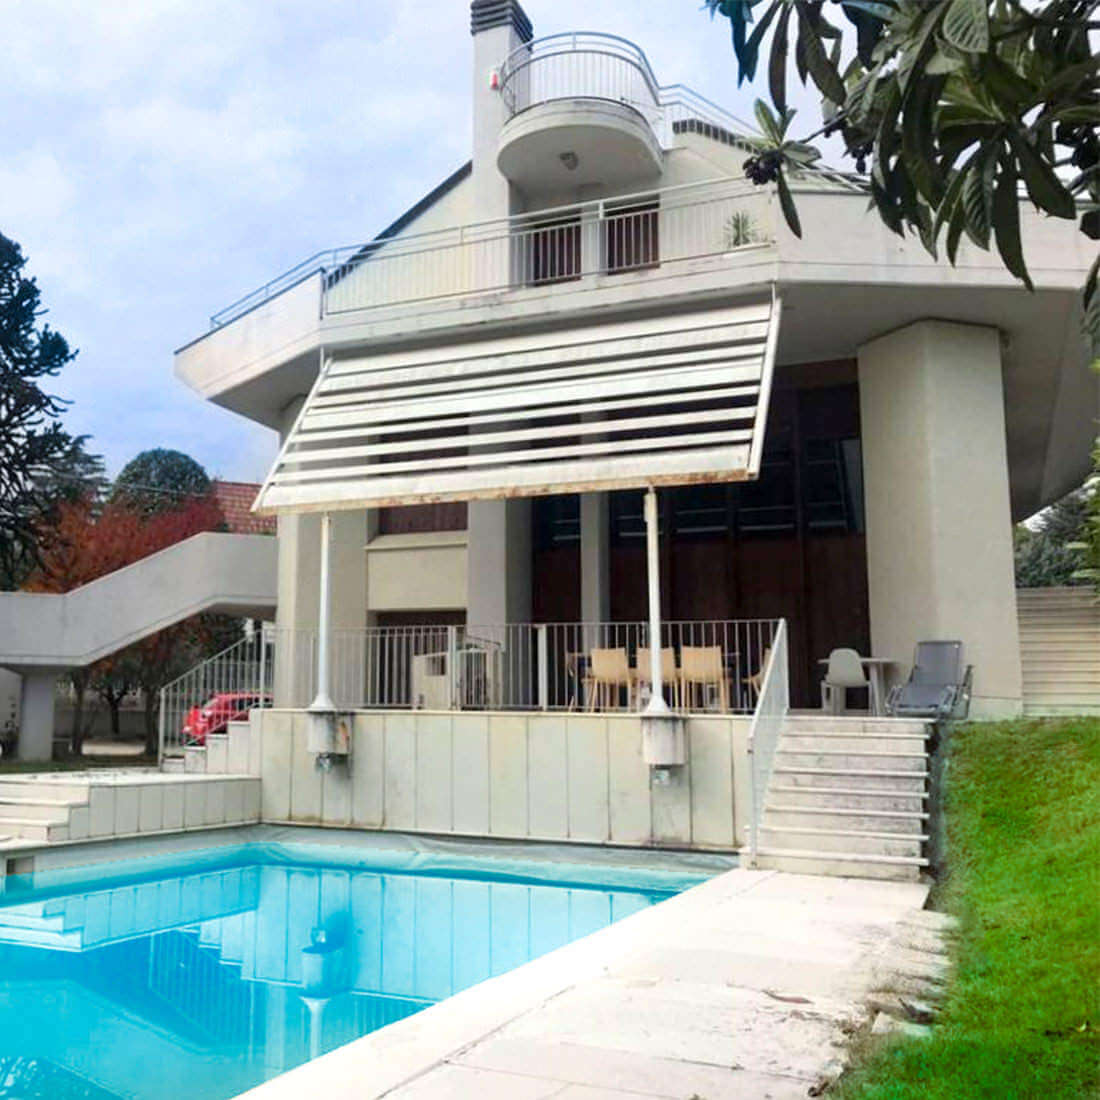 Villa di design - Via Maritani, Cumiana